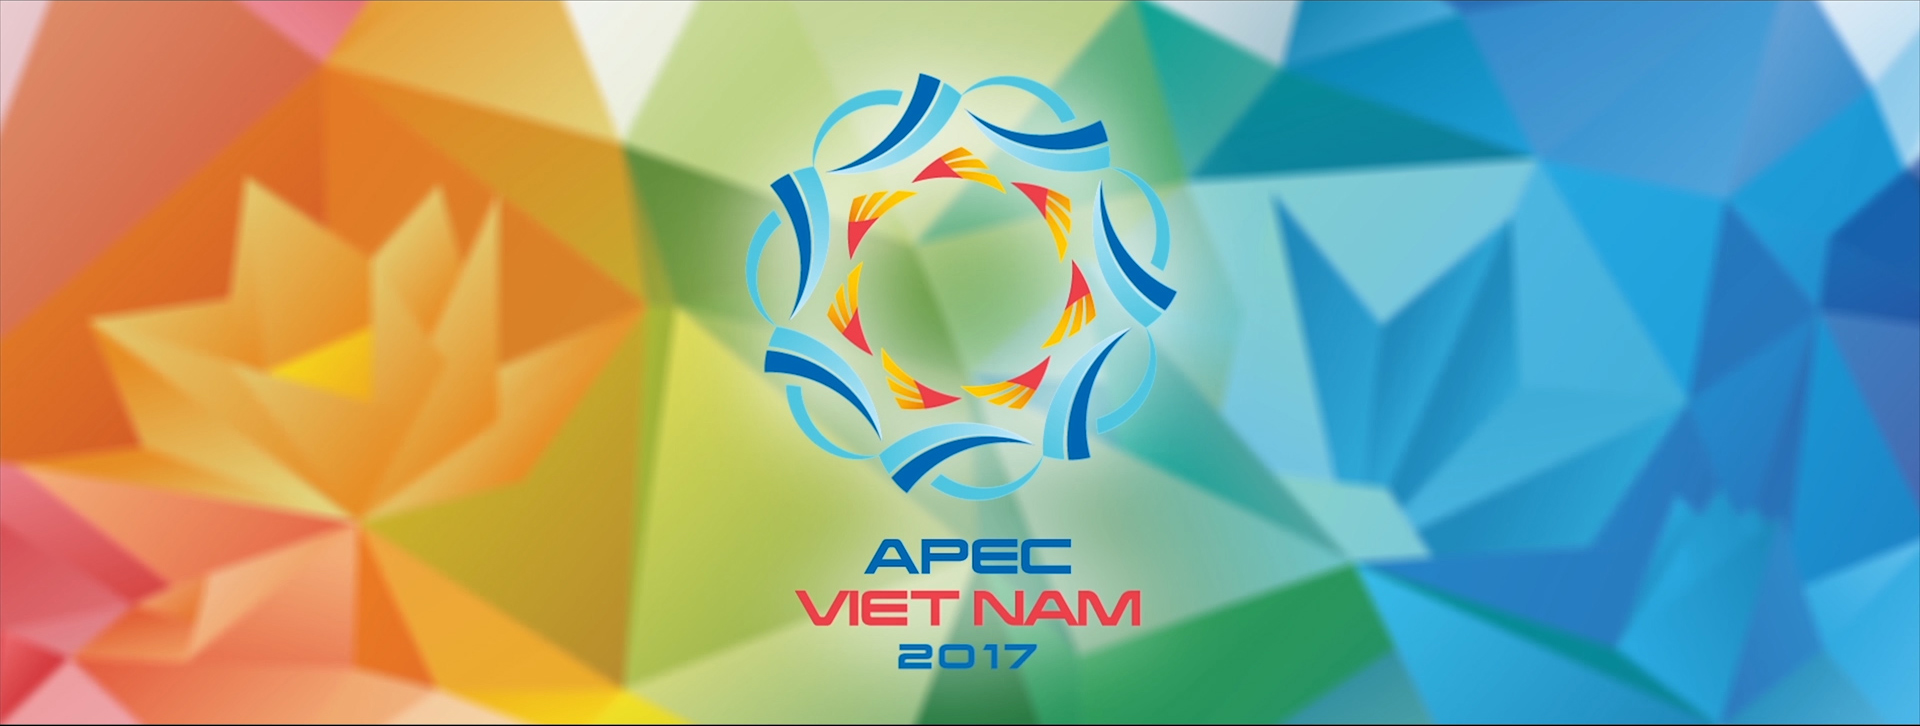 Năm Apec Việt Nam 2017.